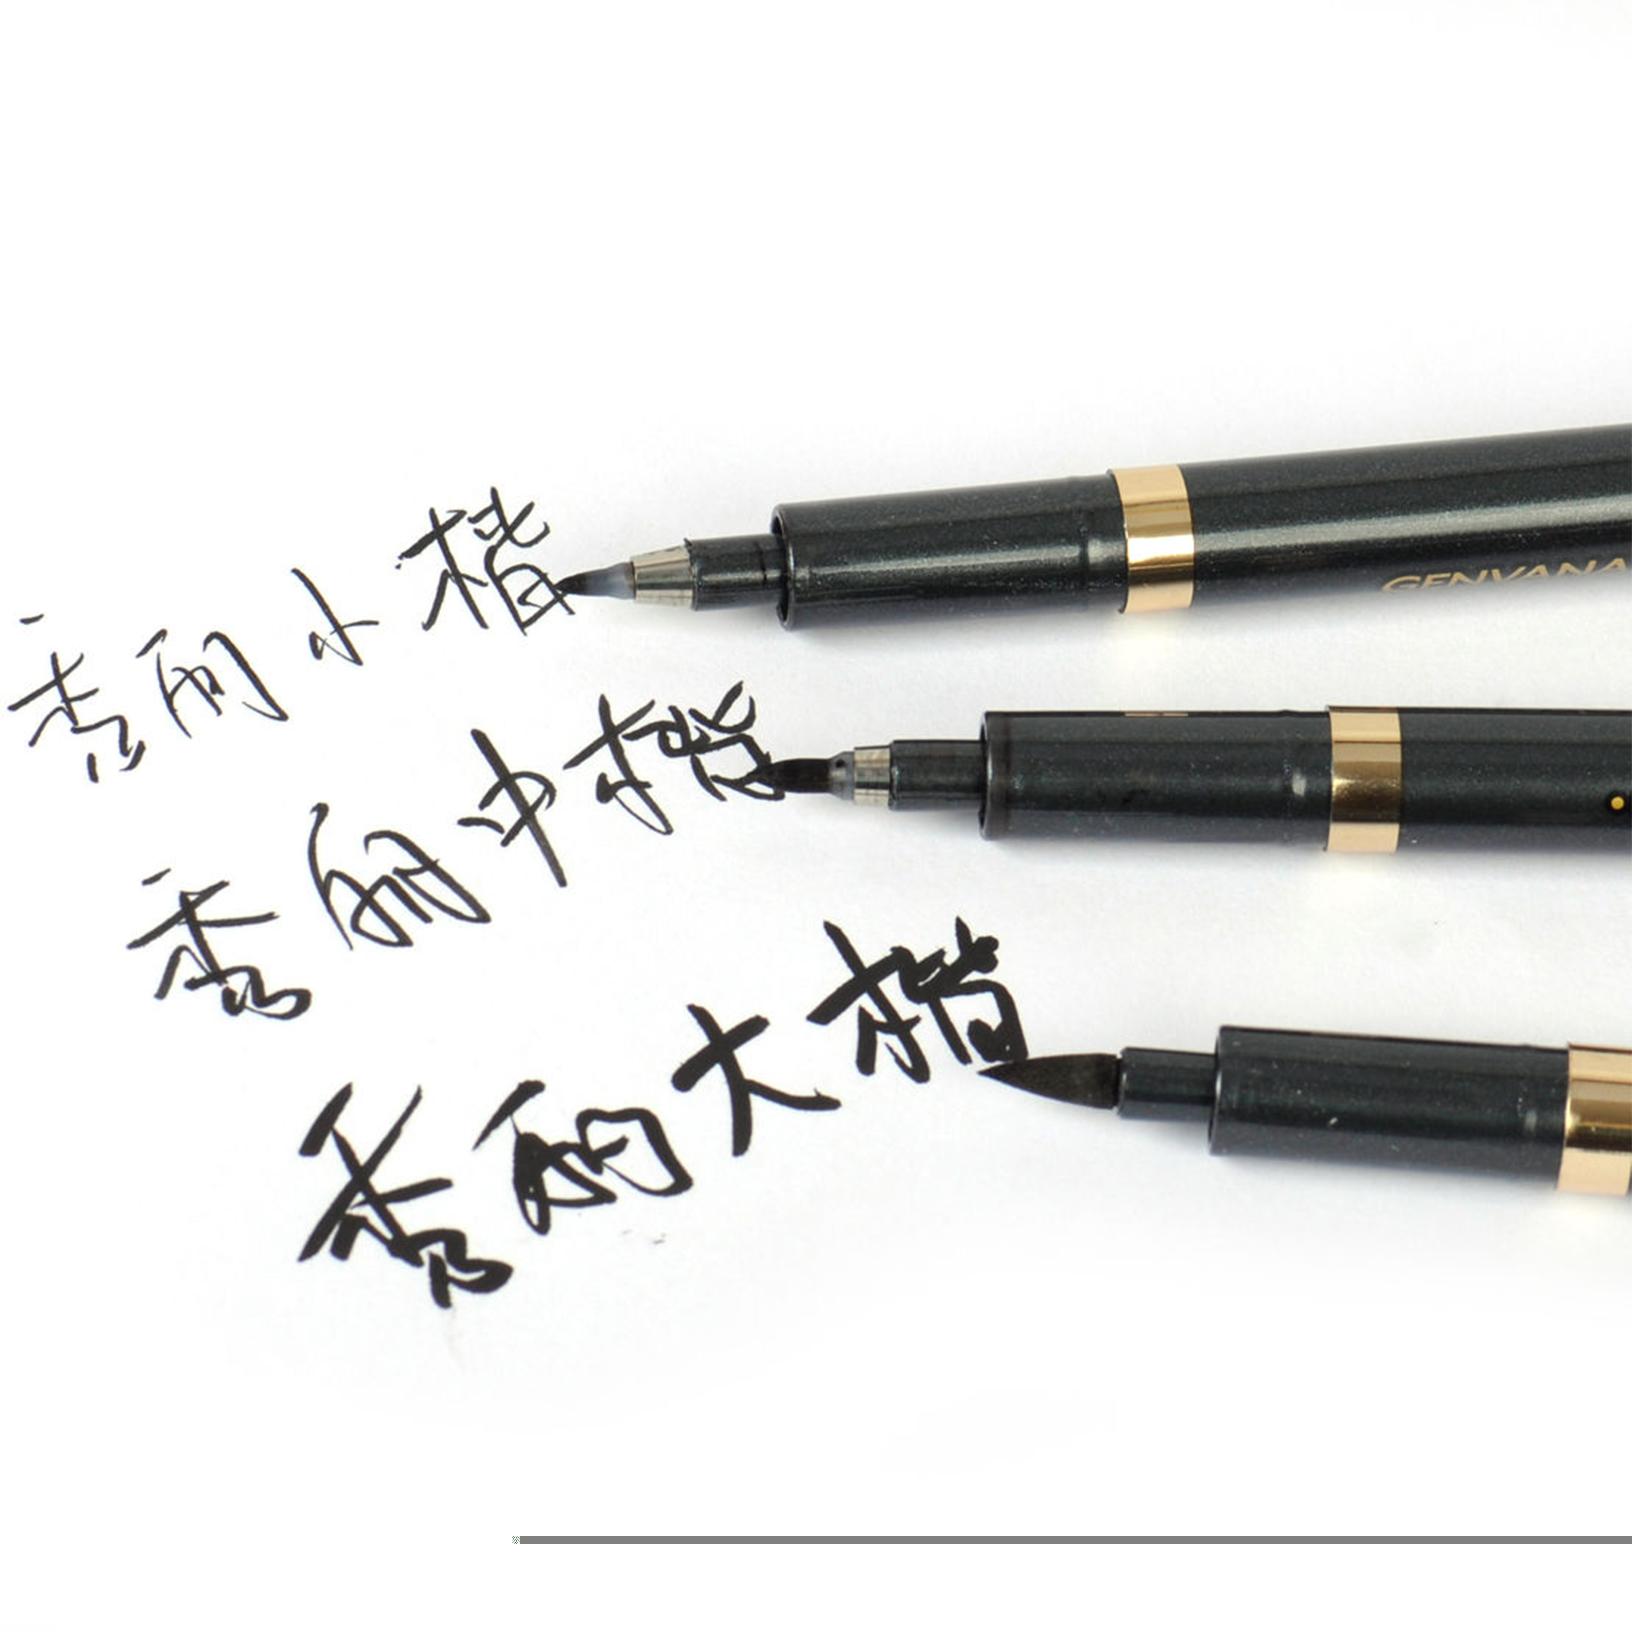 Pcs set chinese japanese calligraphy writing brush pen